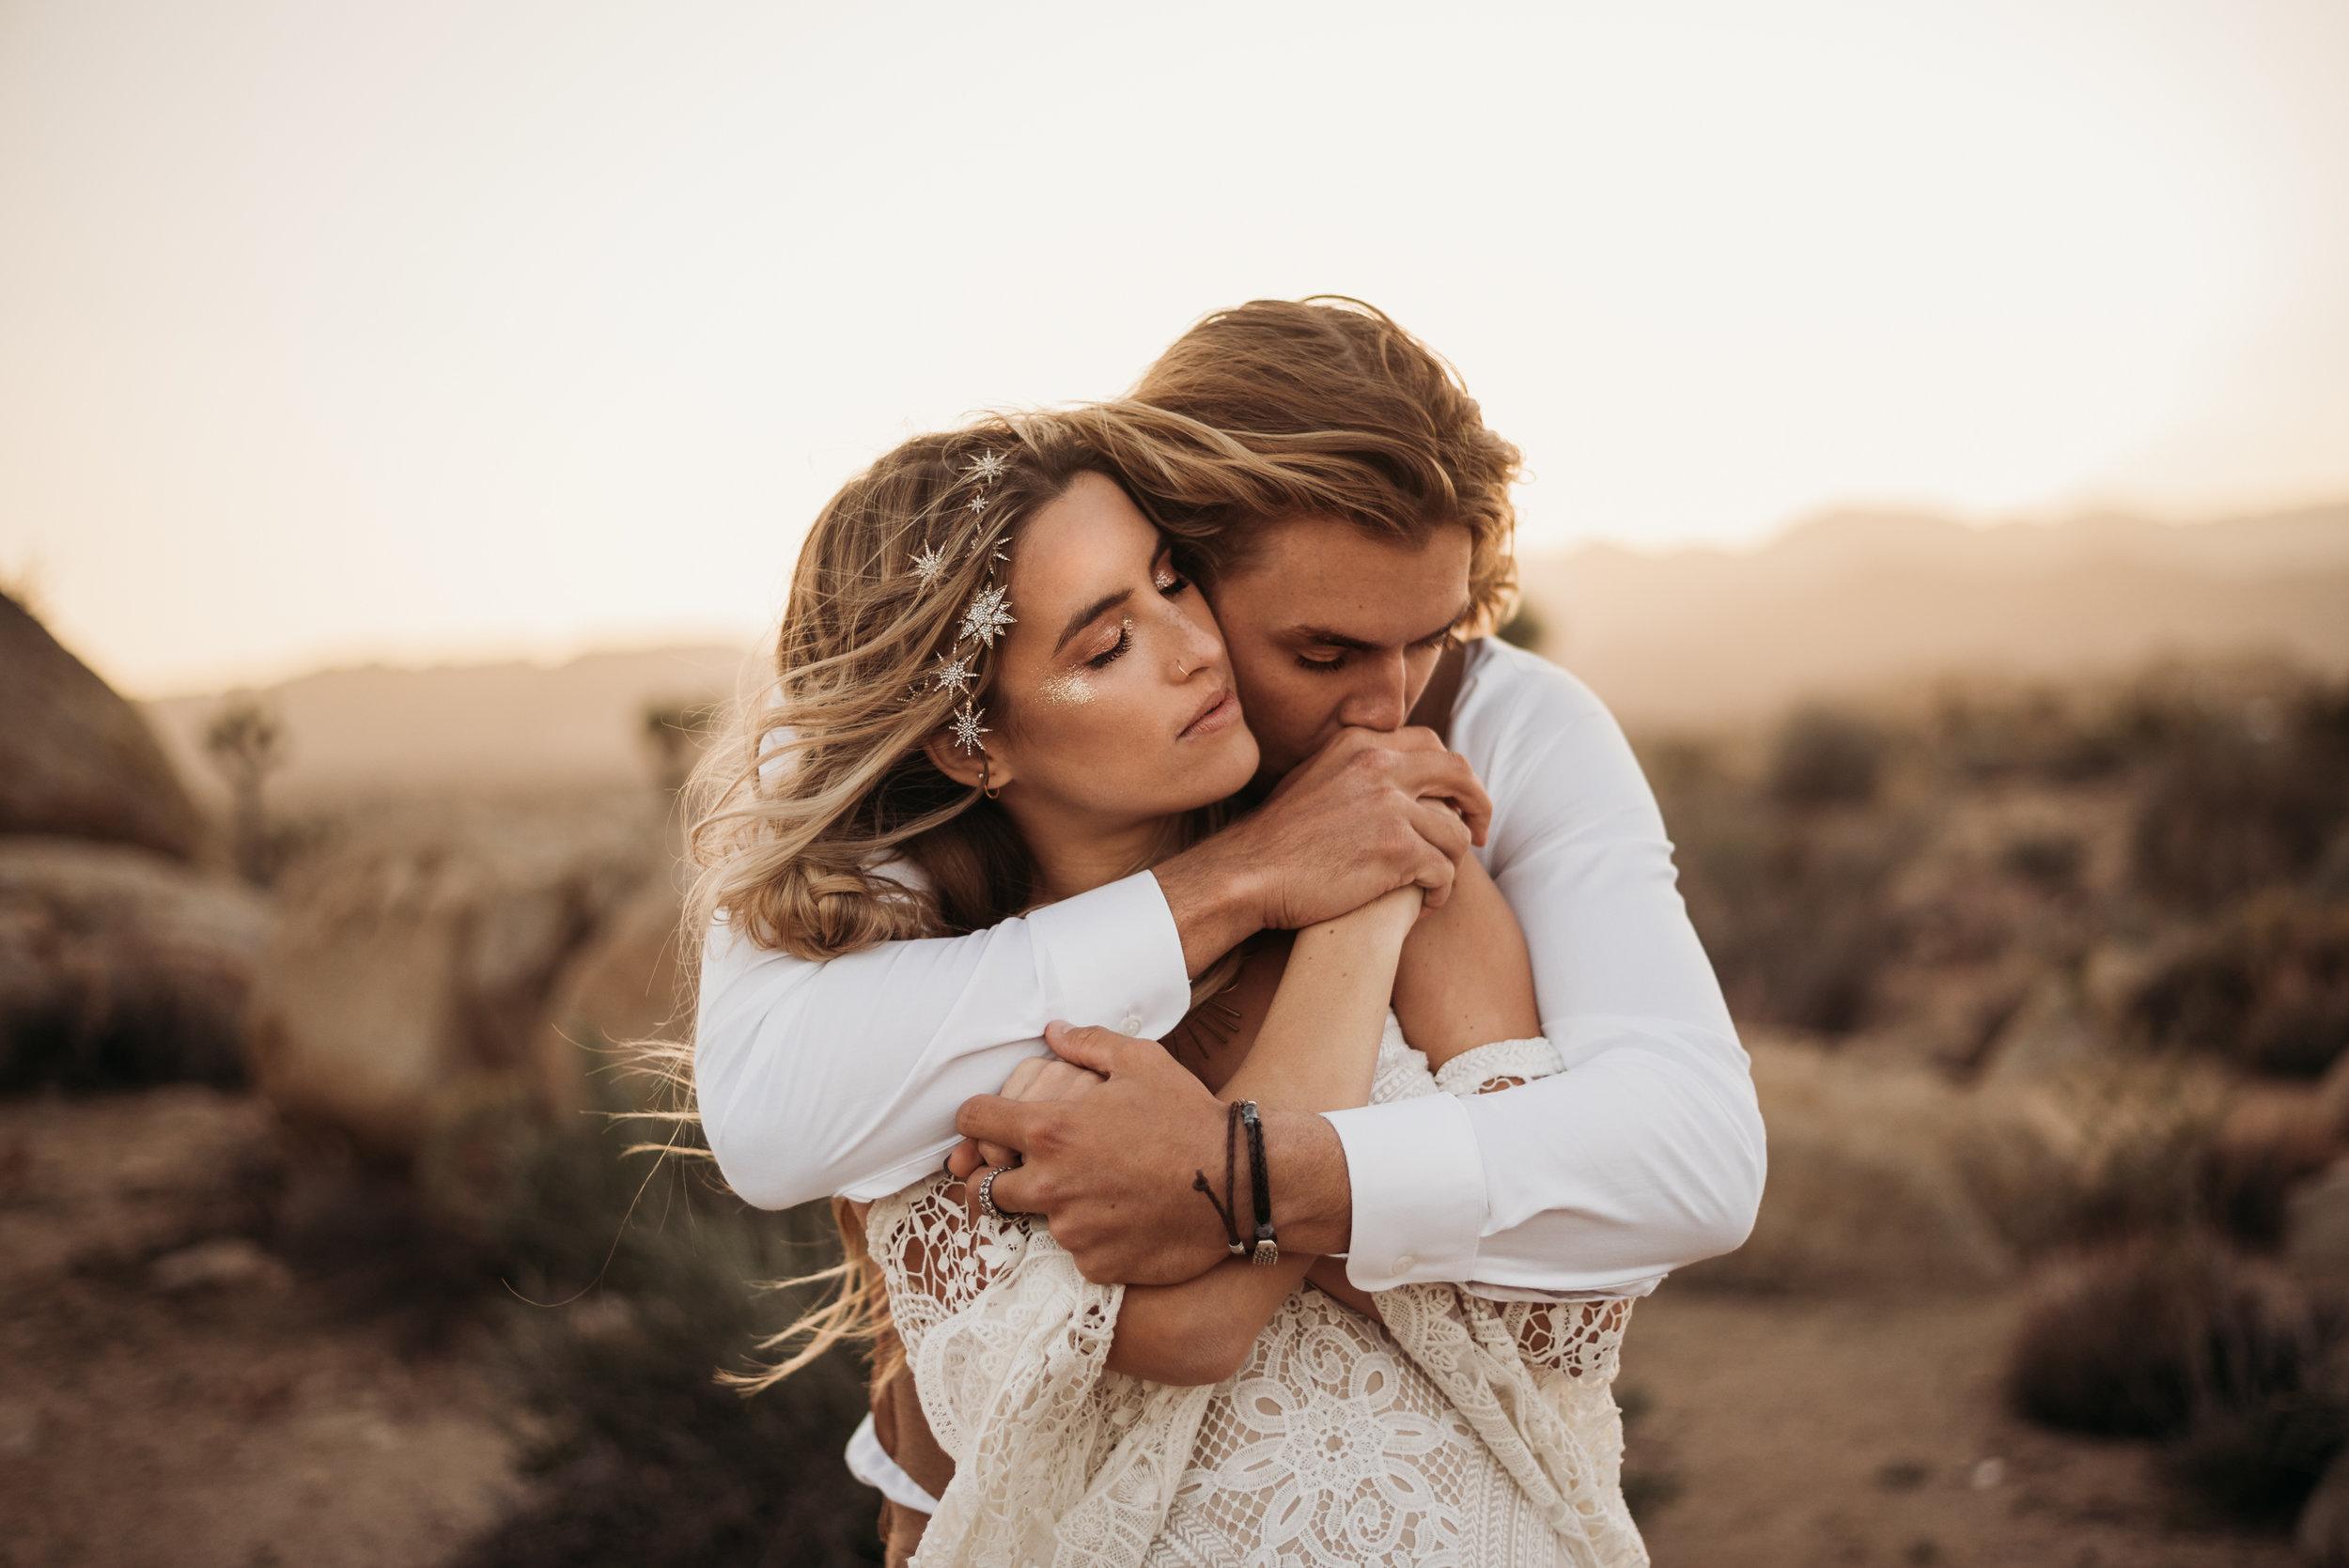 FortSt.John_photographer_TyraEPhotography_Wedding_Couple_Family_Photograhy_DawsonCreek_Elopement_Bride_Boduoir_Portraits-.jpg